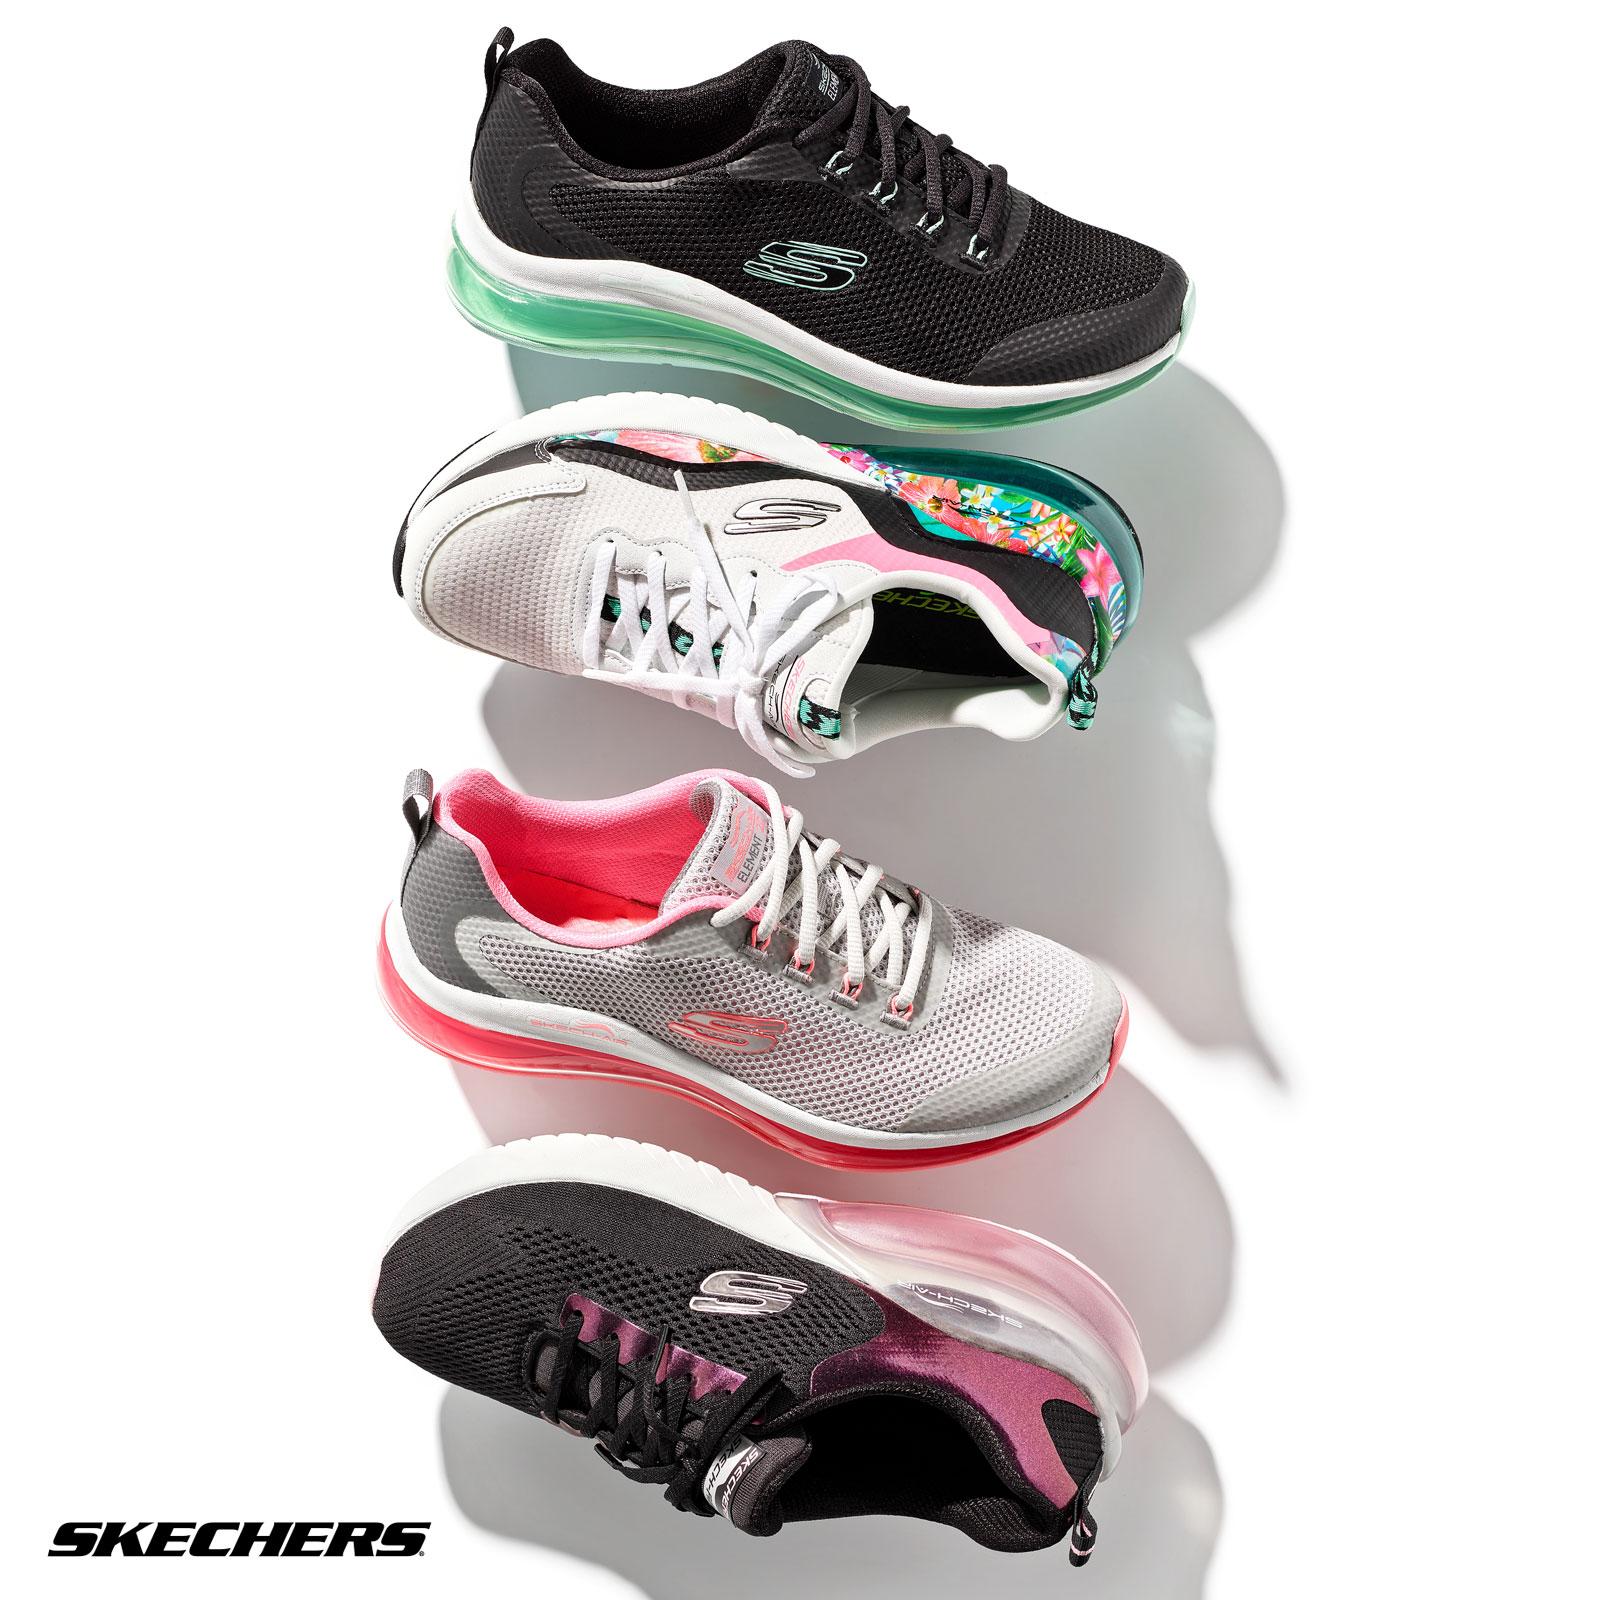 CENTRI-Skechers-mid-season-sale-SS21-1600x1600